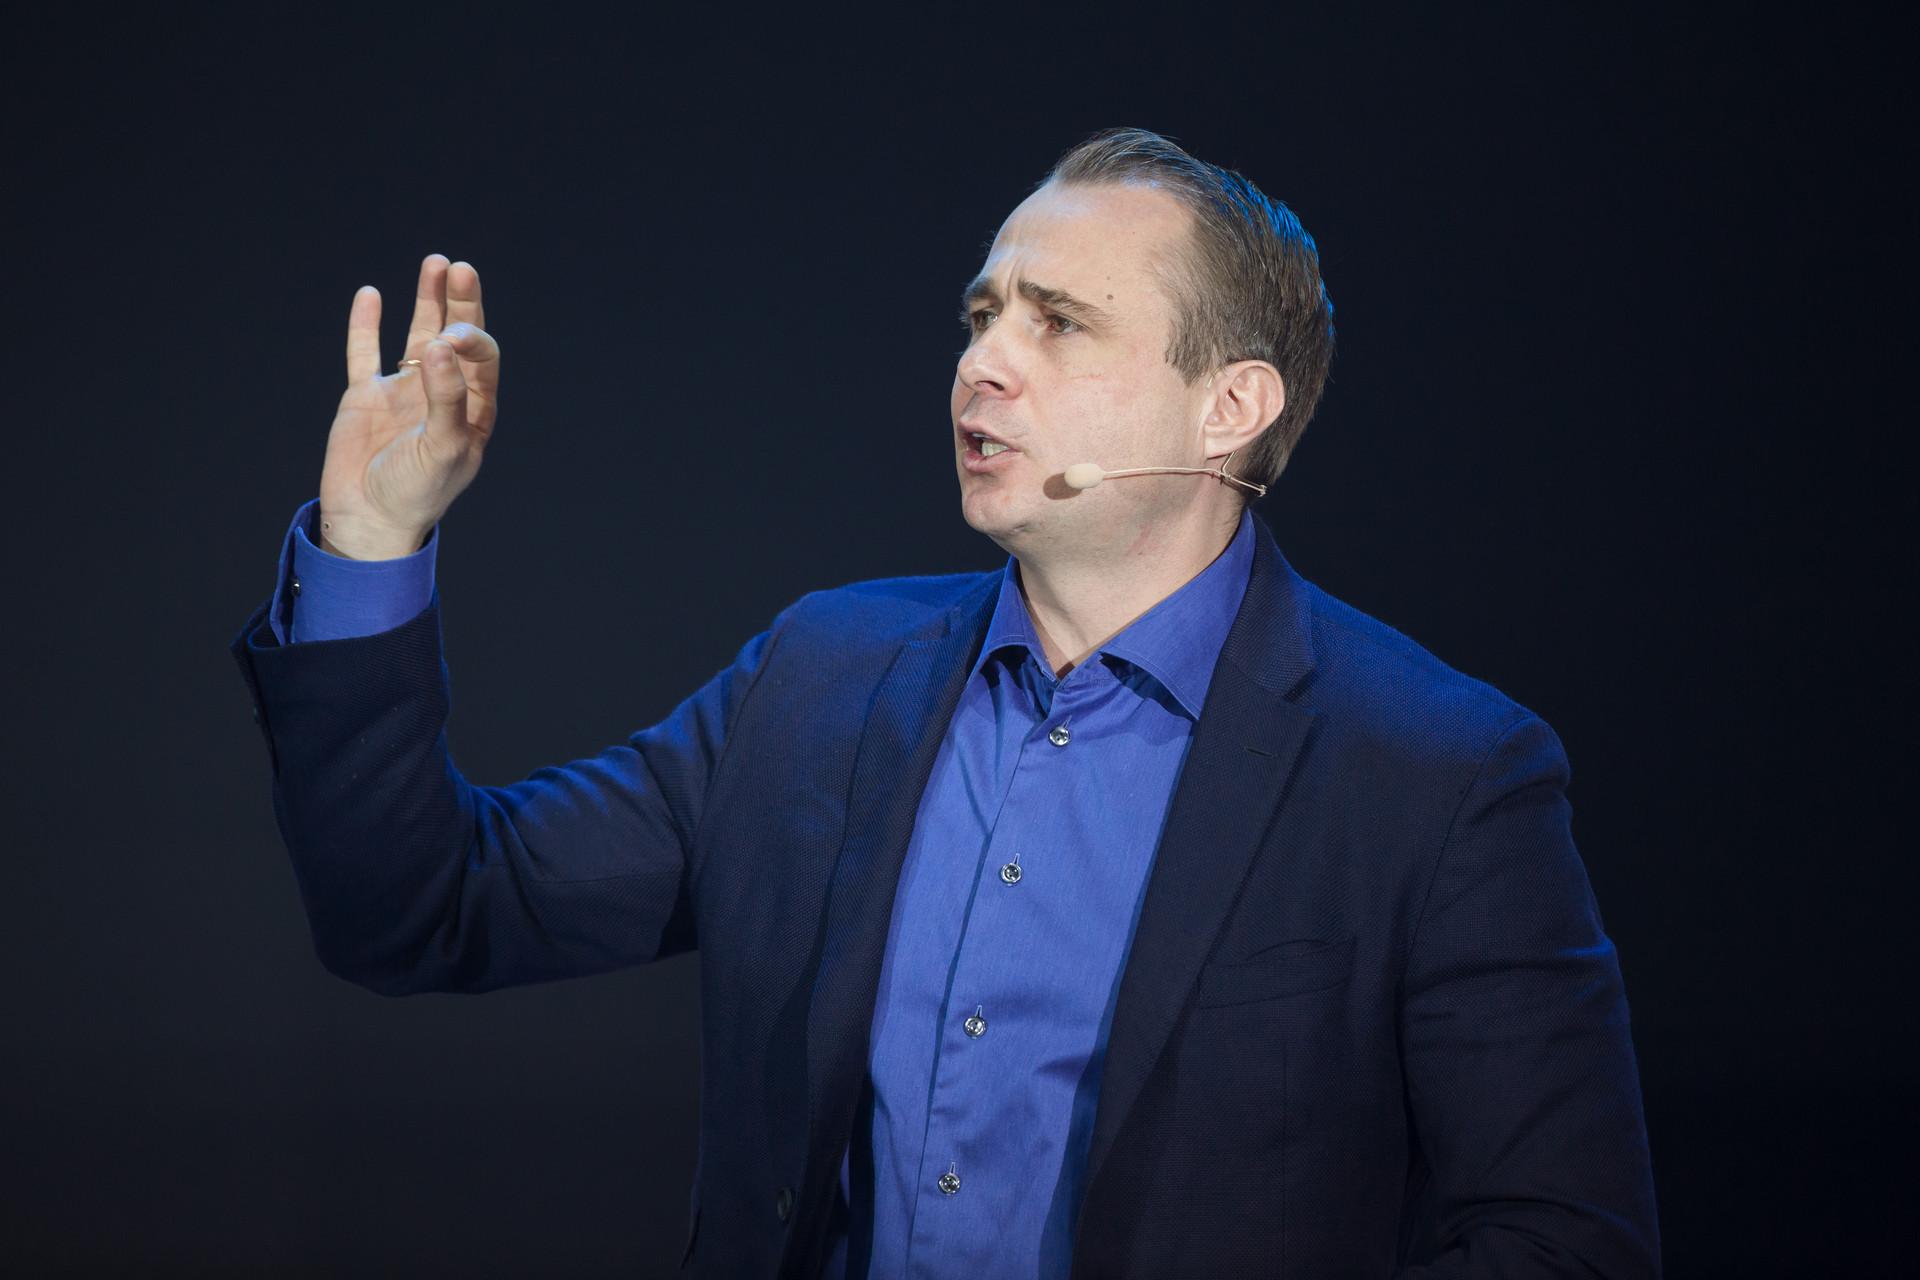 Оскар Хартманн – спикер форума «Мой бизнес в Москве»